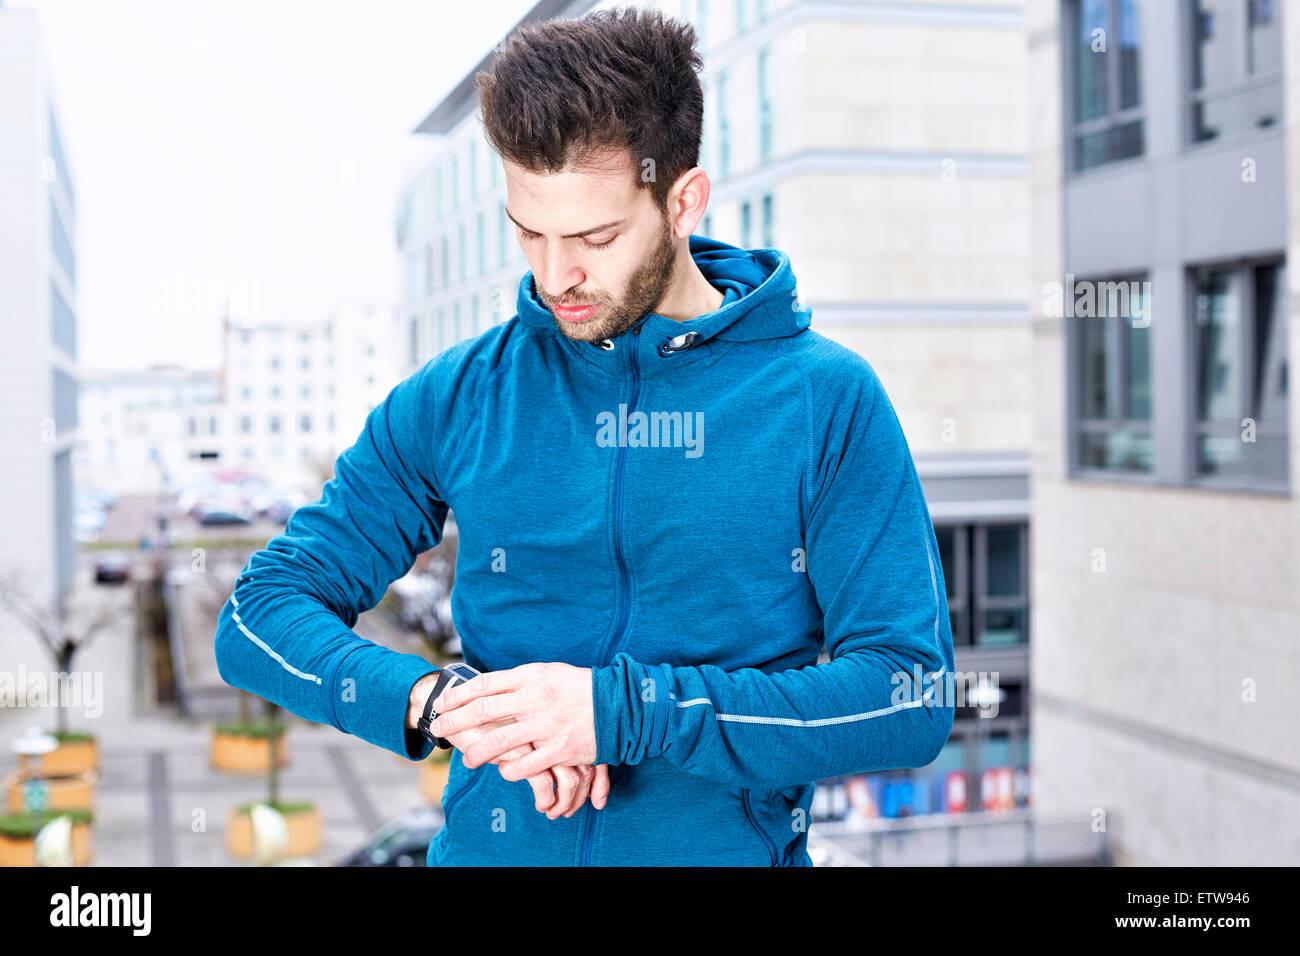 Germany, Magdeburg, young man looking at his heart rate monitor - Stock Image